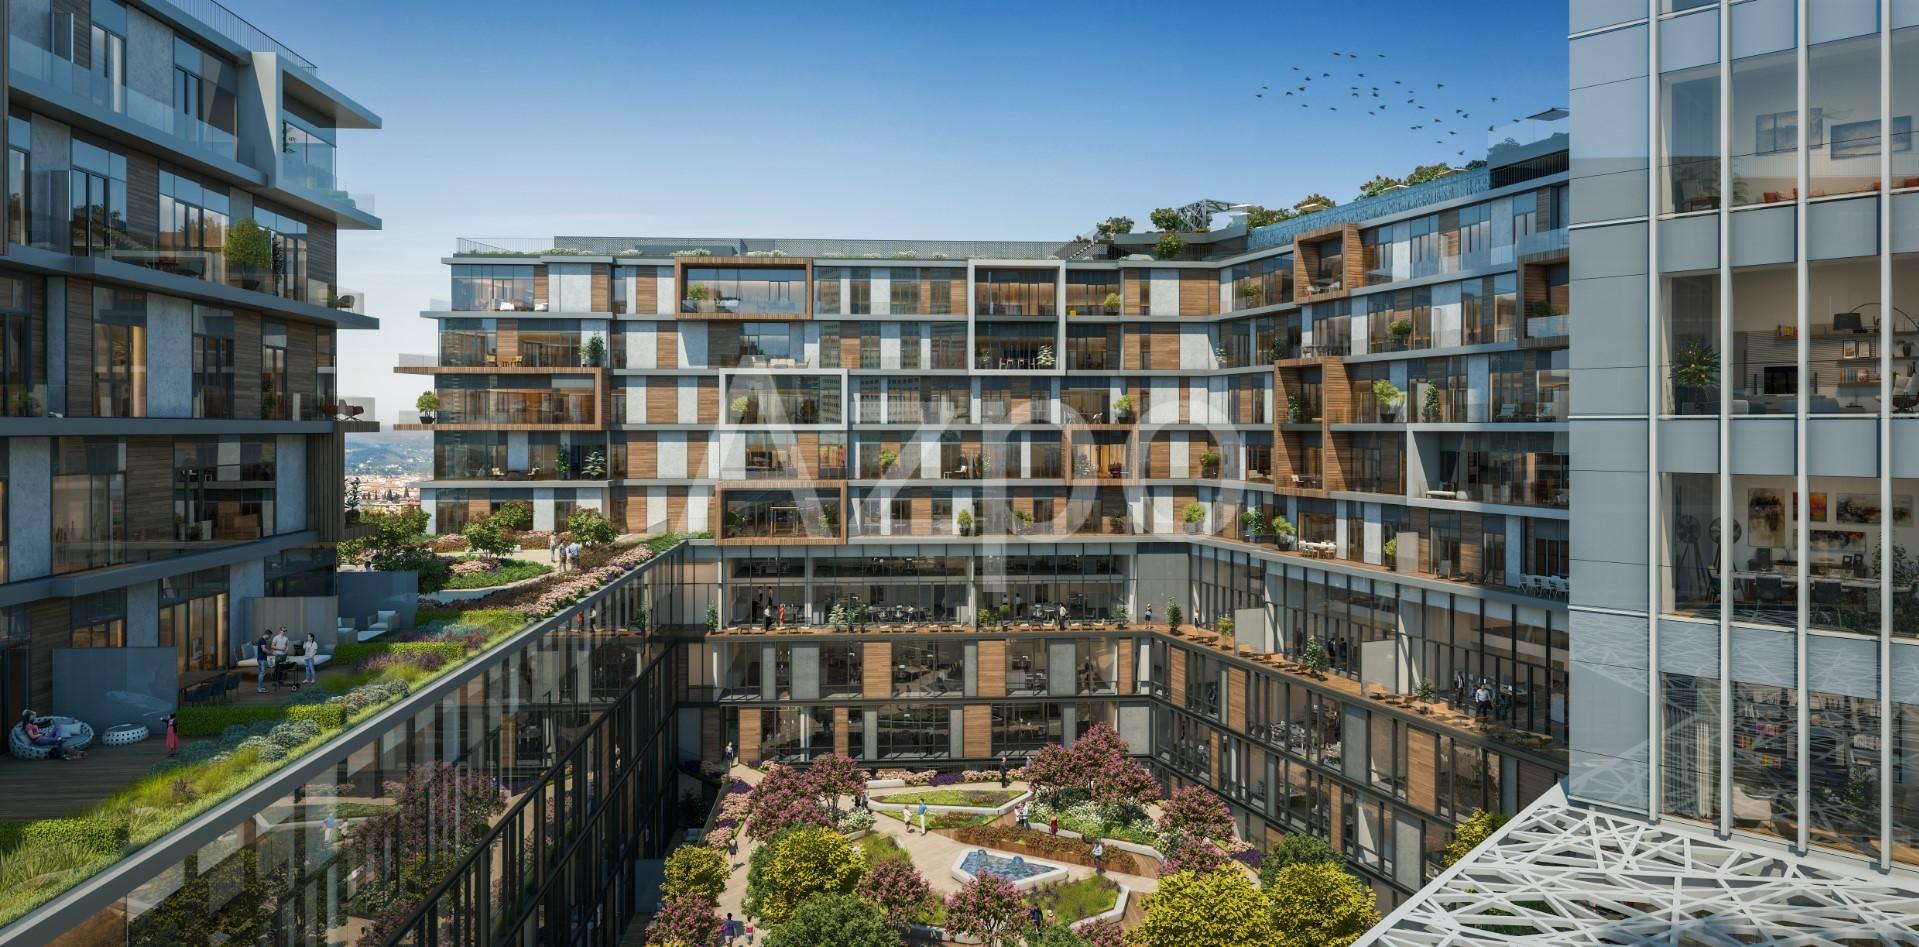 Квартиры в резиденции premium класса в центре Стамбула - Фото 17